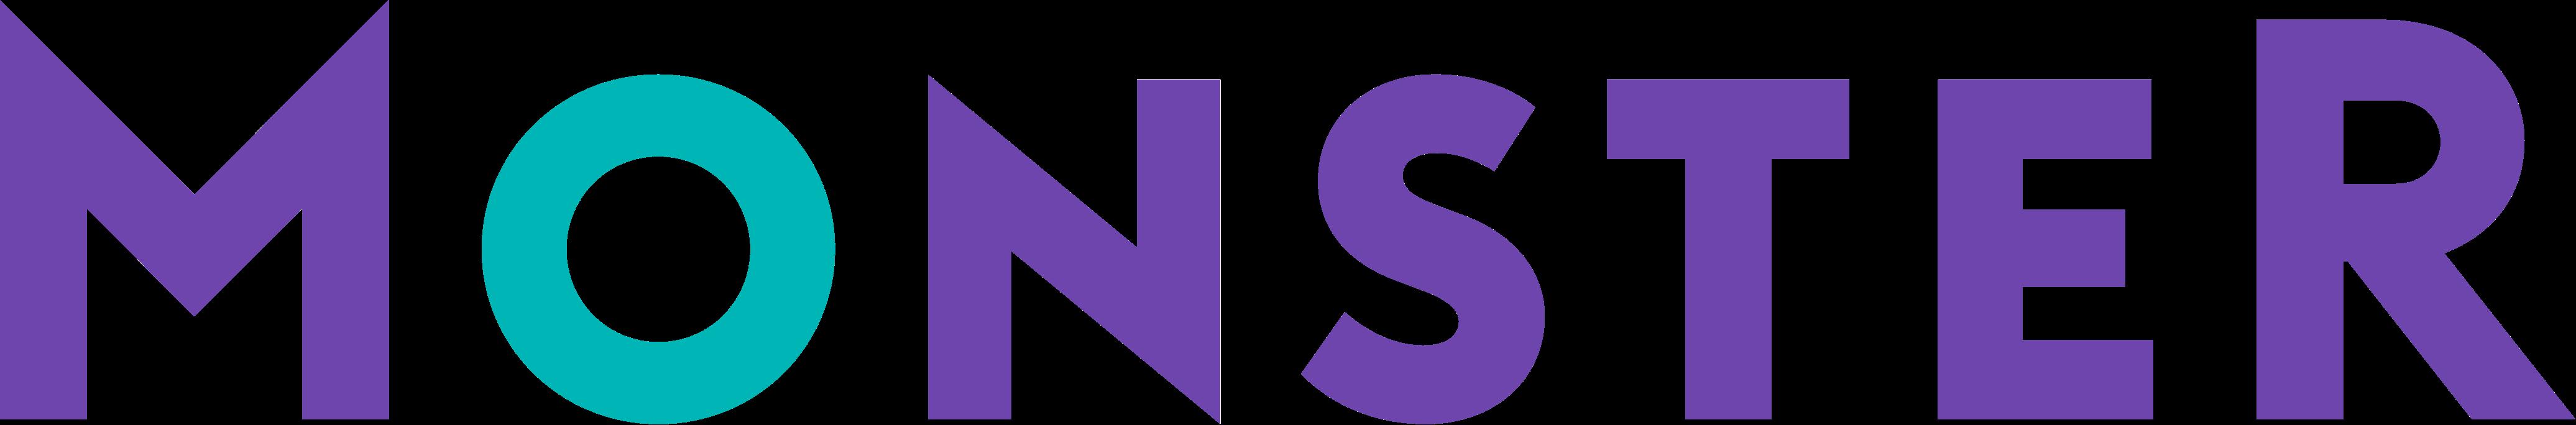 monster-logo-color